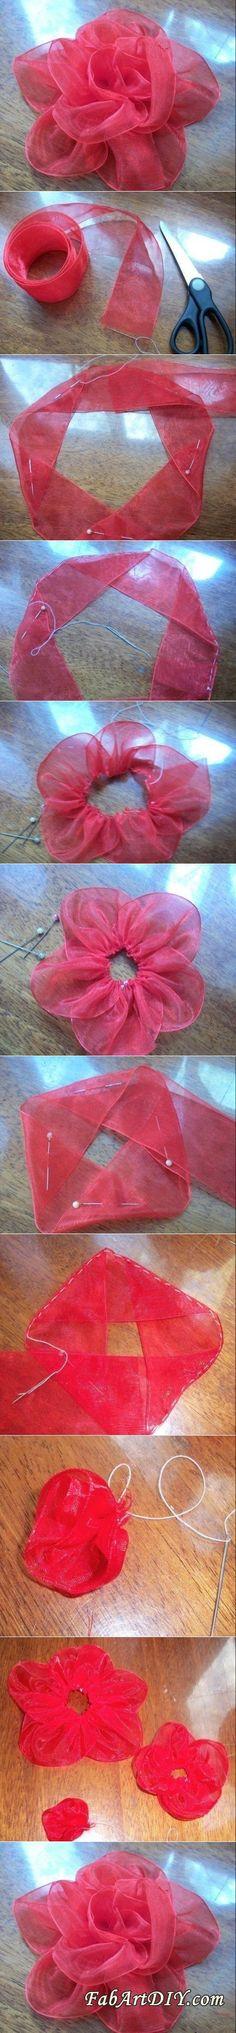 DIY Big Silk Ribbon Rose - http://mistergandmecrafts.me/diy-big-silk-ribbon-rose/